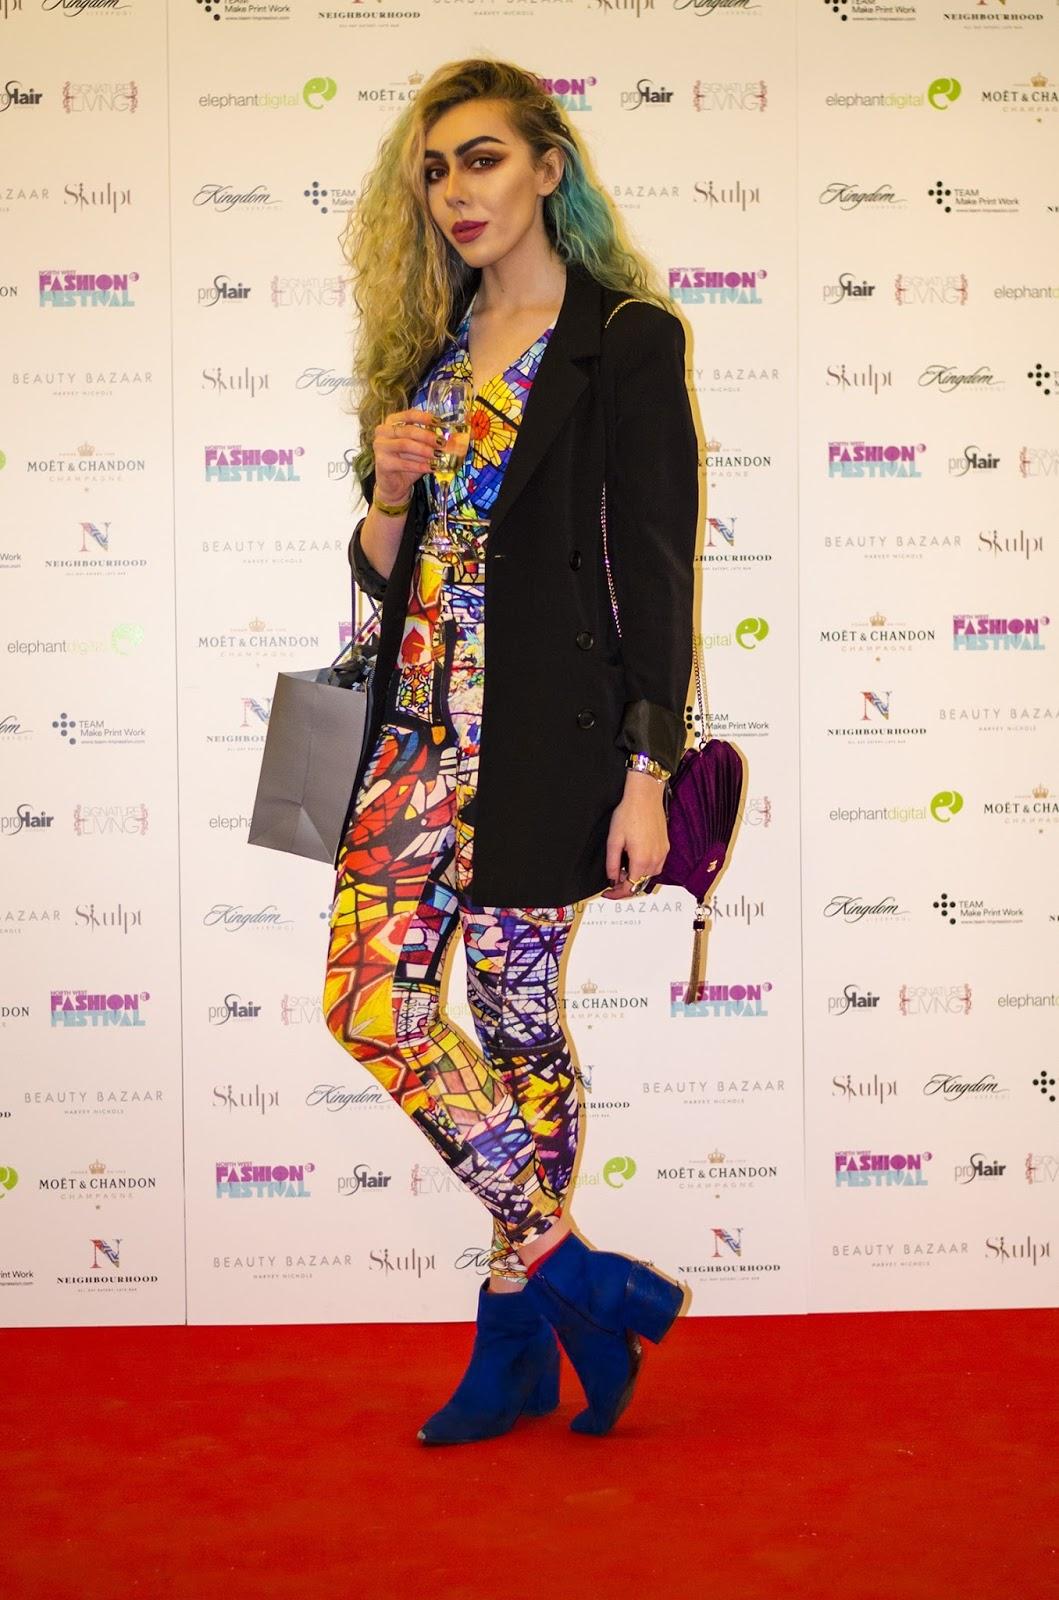 Stephi LaReine North West Fashion Festival 2016